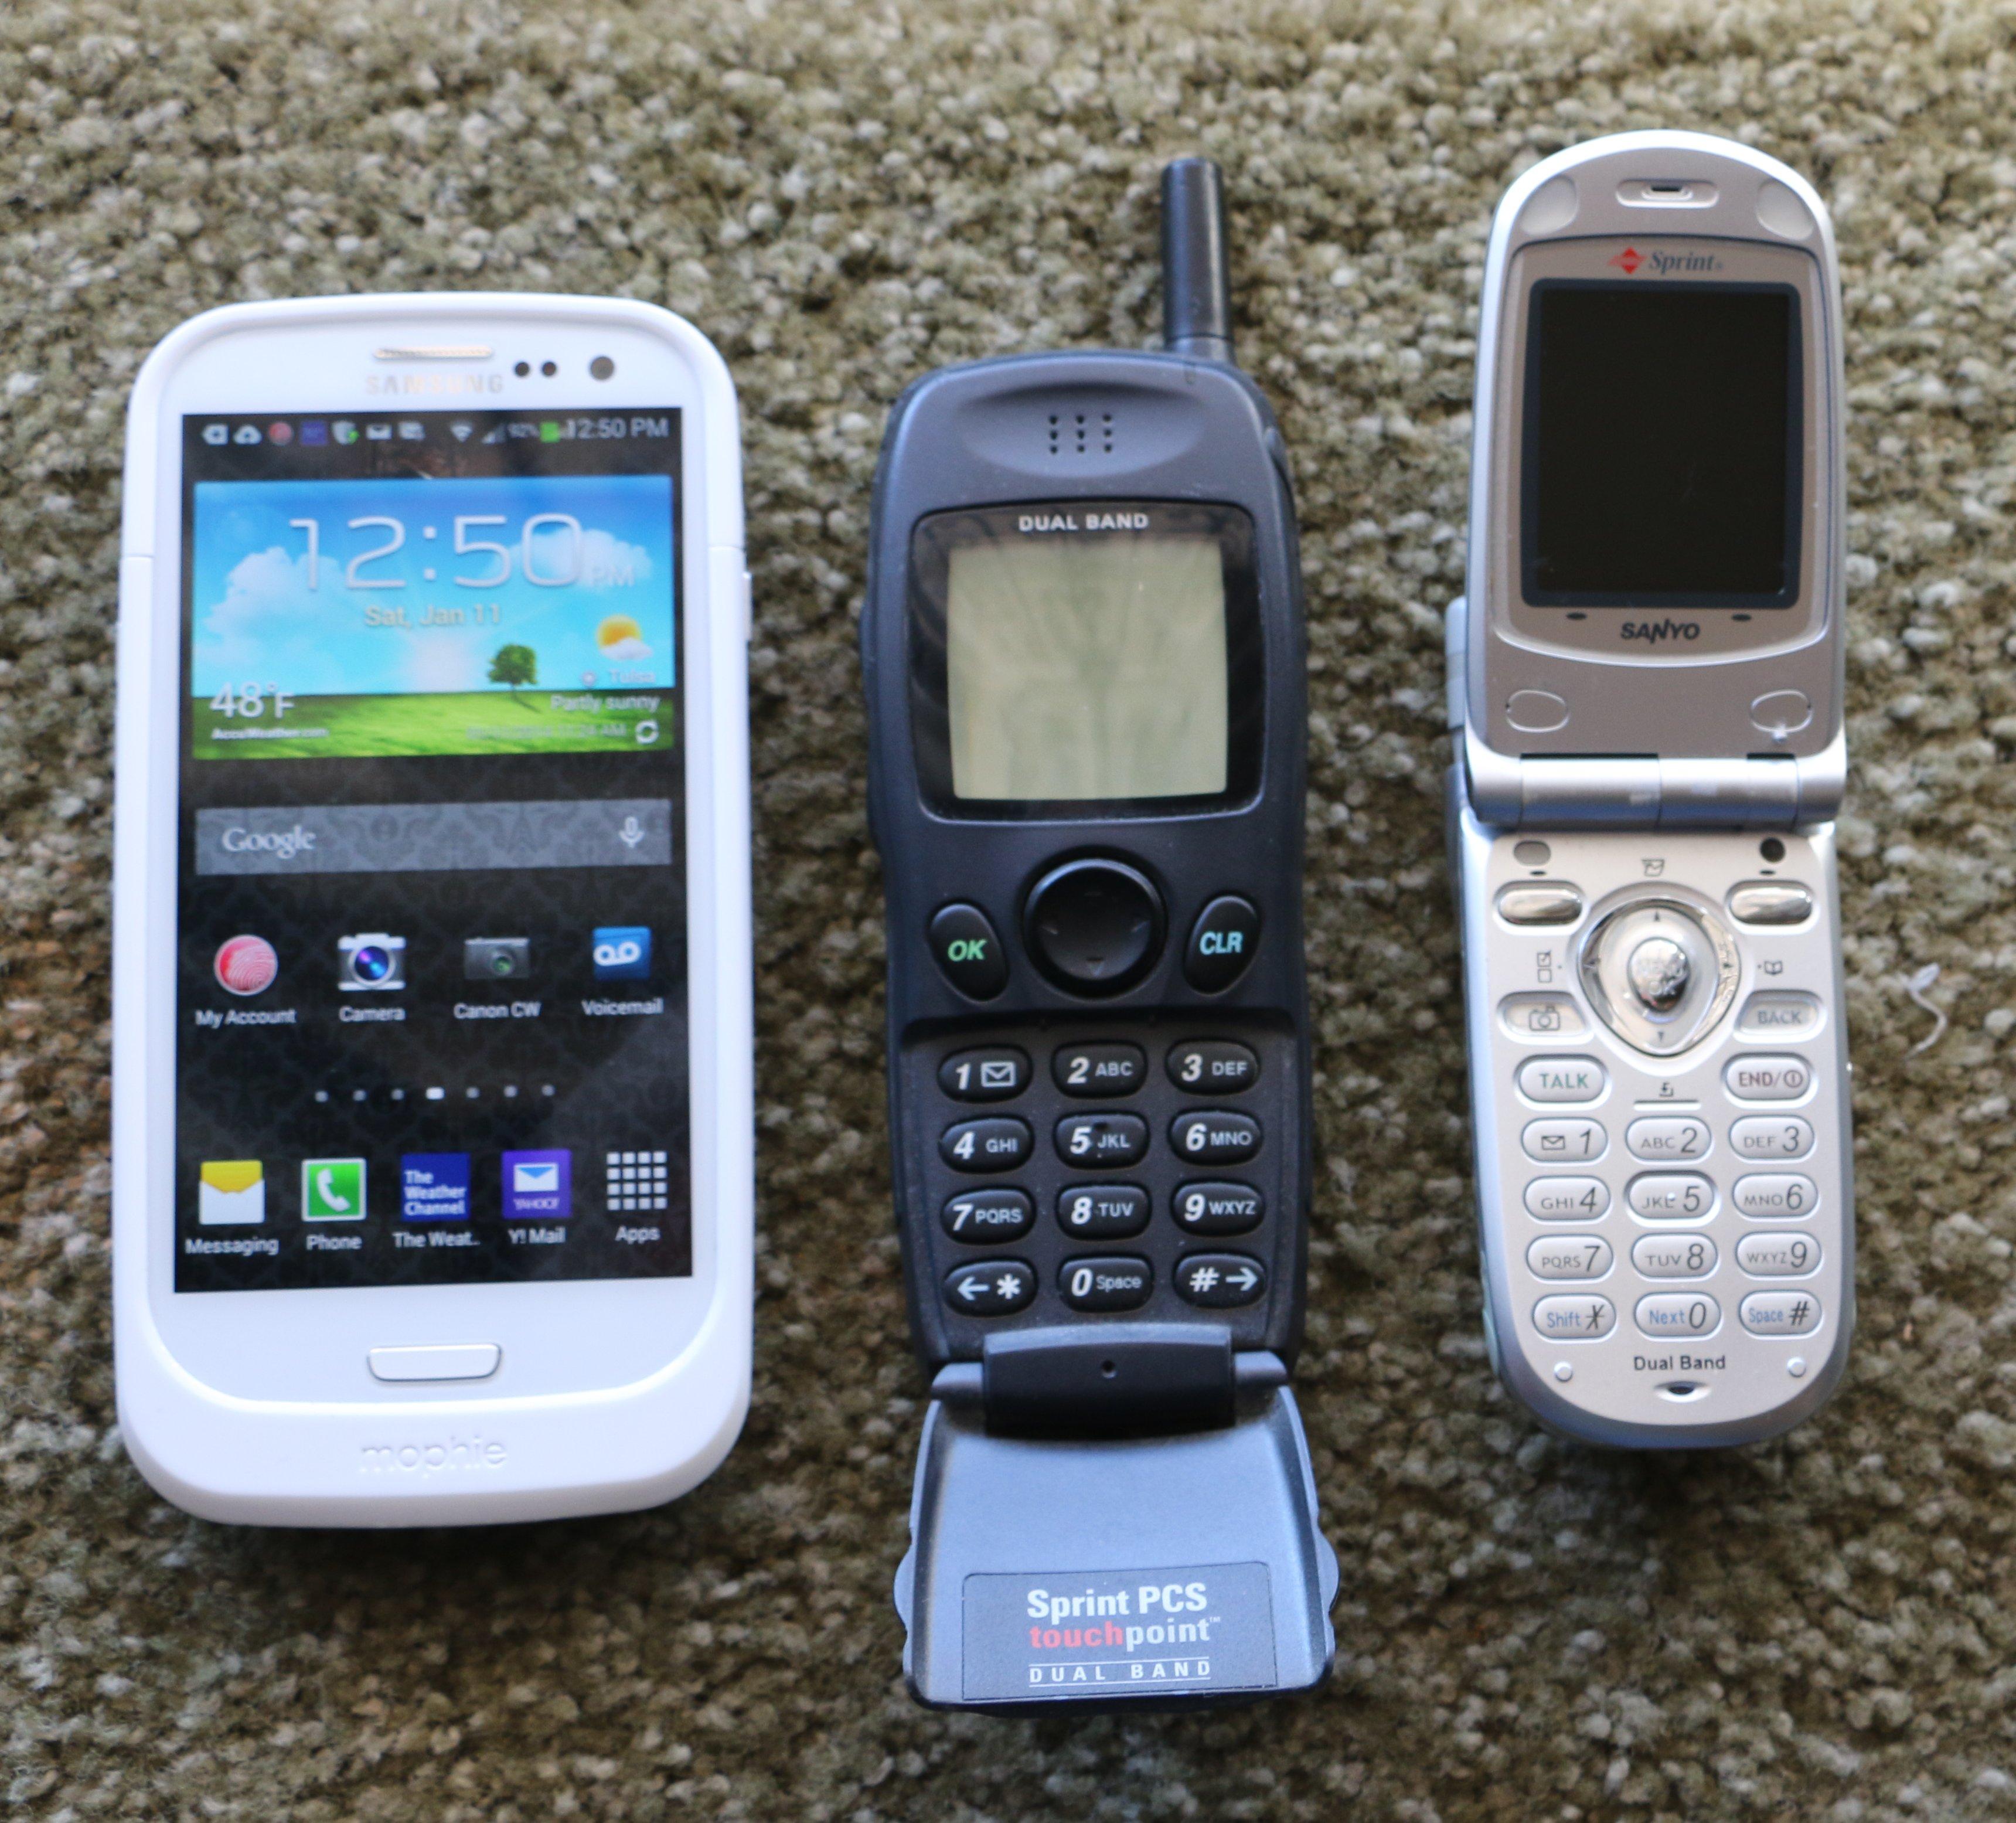 My old and new Phones 70D 01112014.jpg.JPG